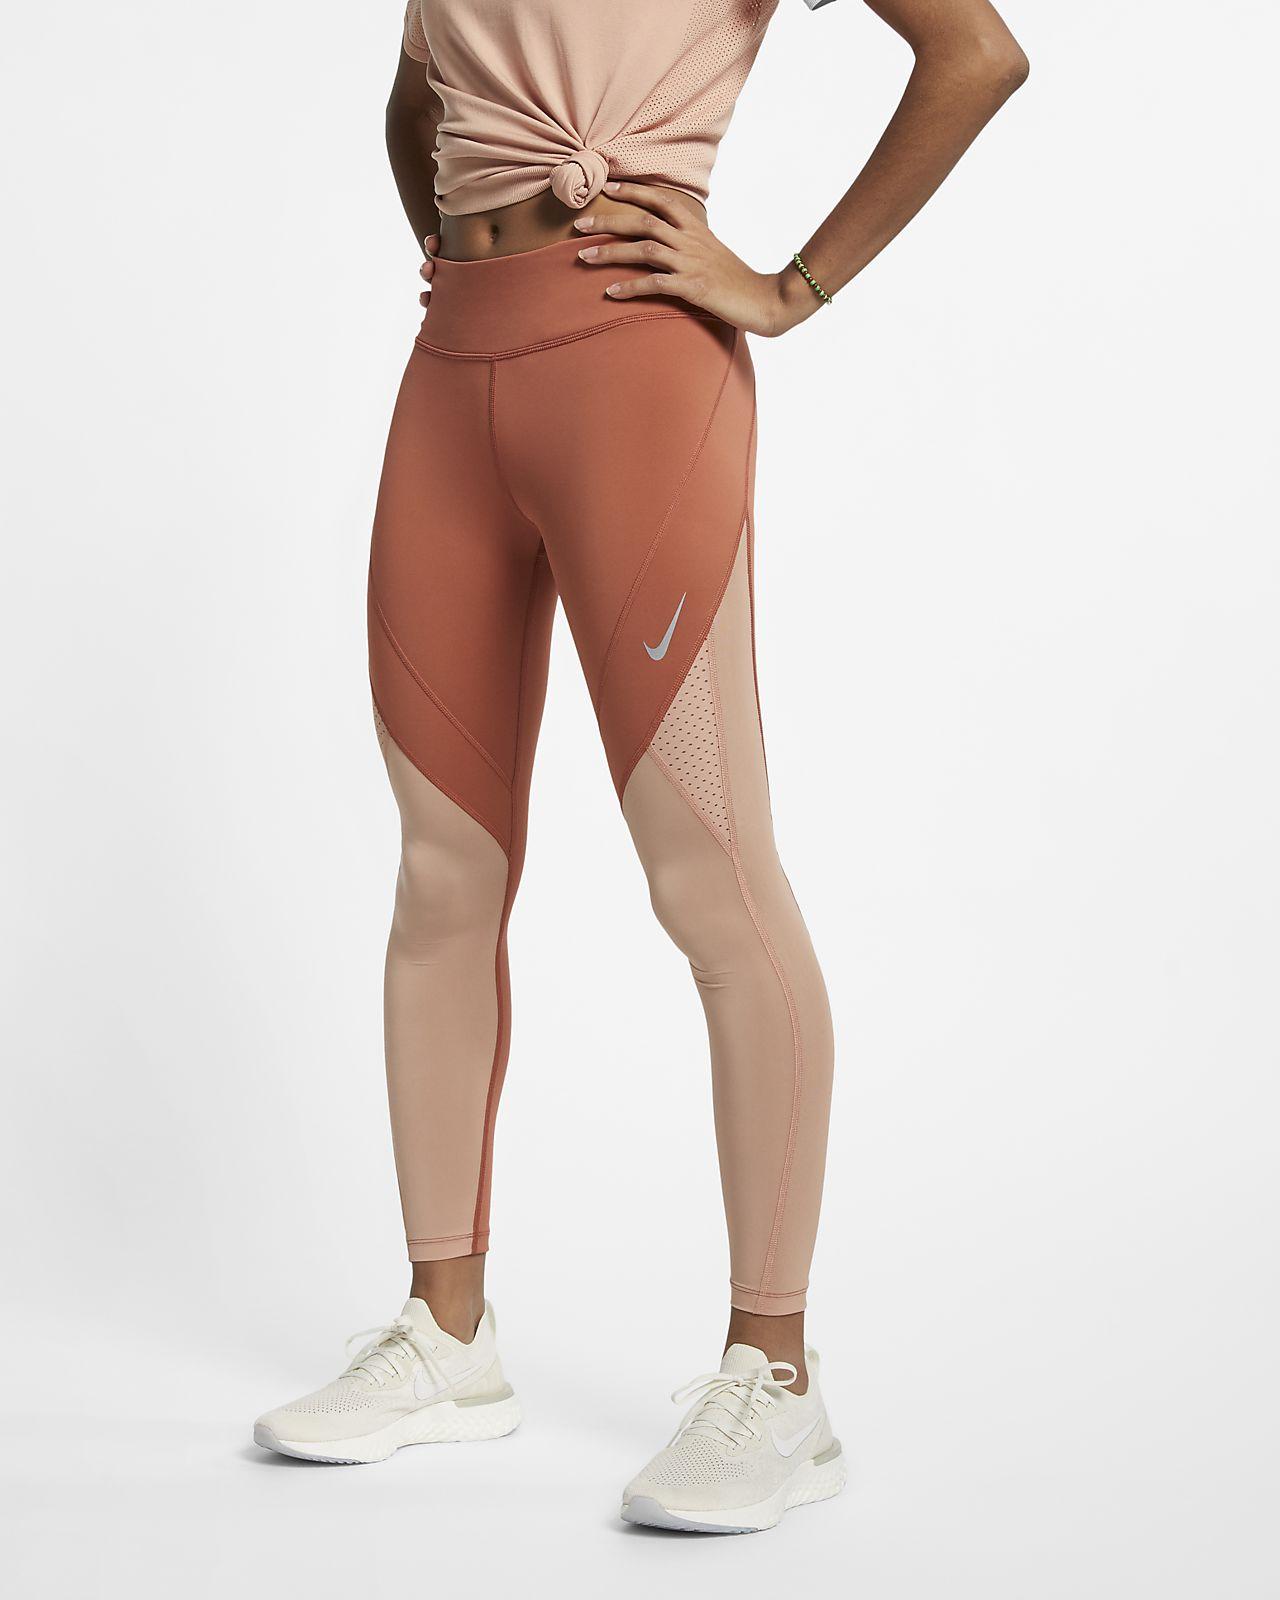 Nike Epic Lux Malles de running de 7/8 - Dona